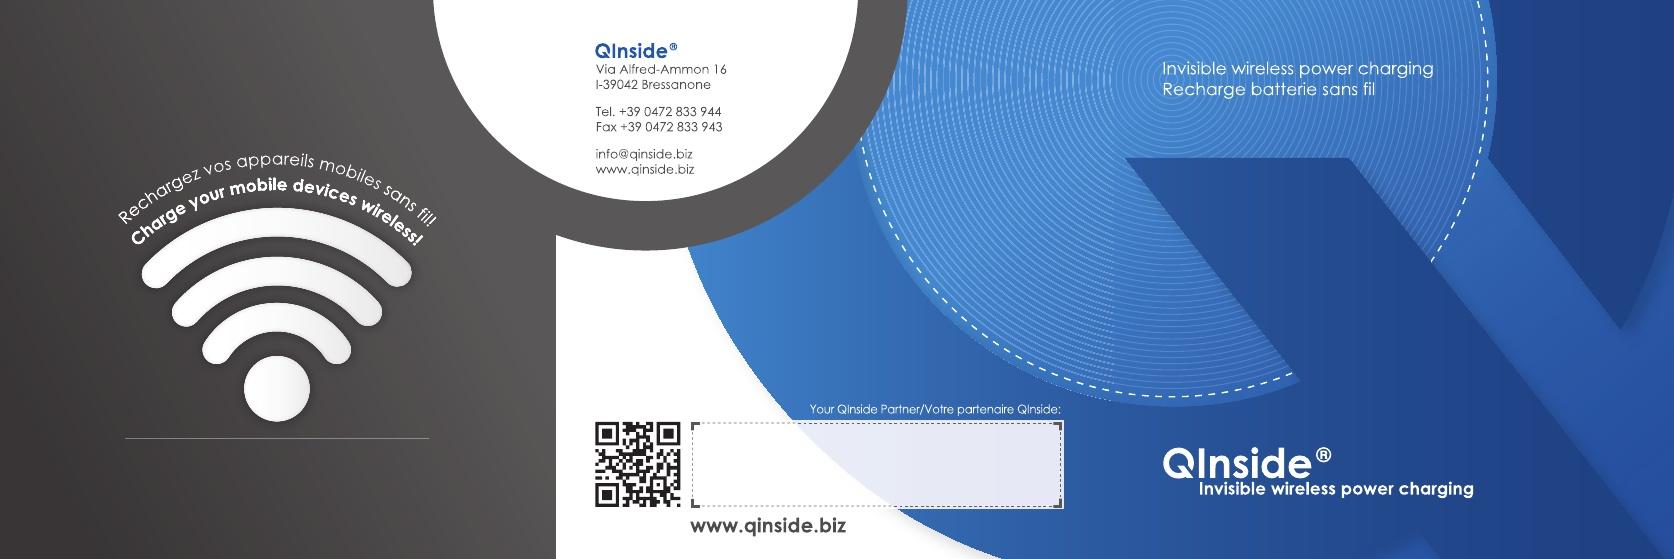 Folheto Qinside 2013